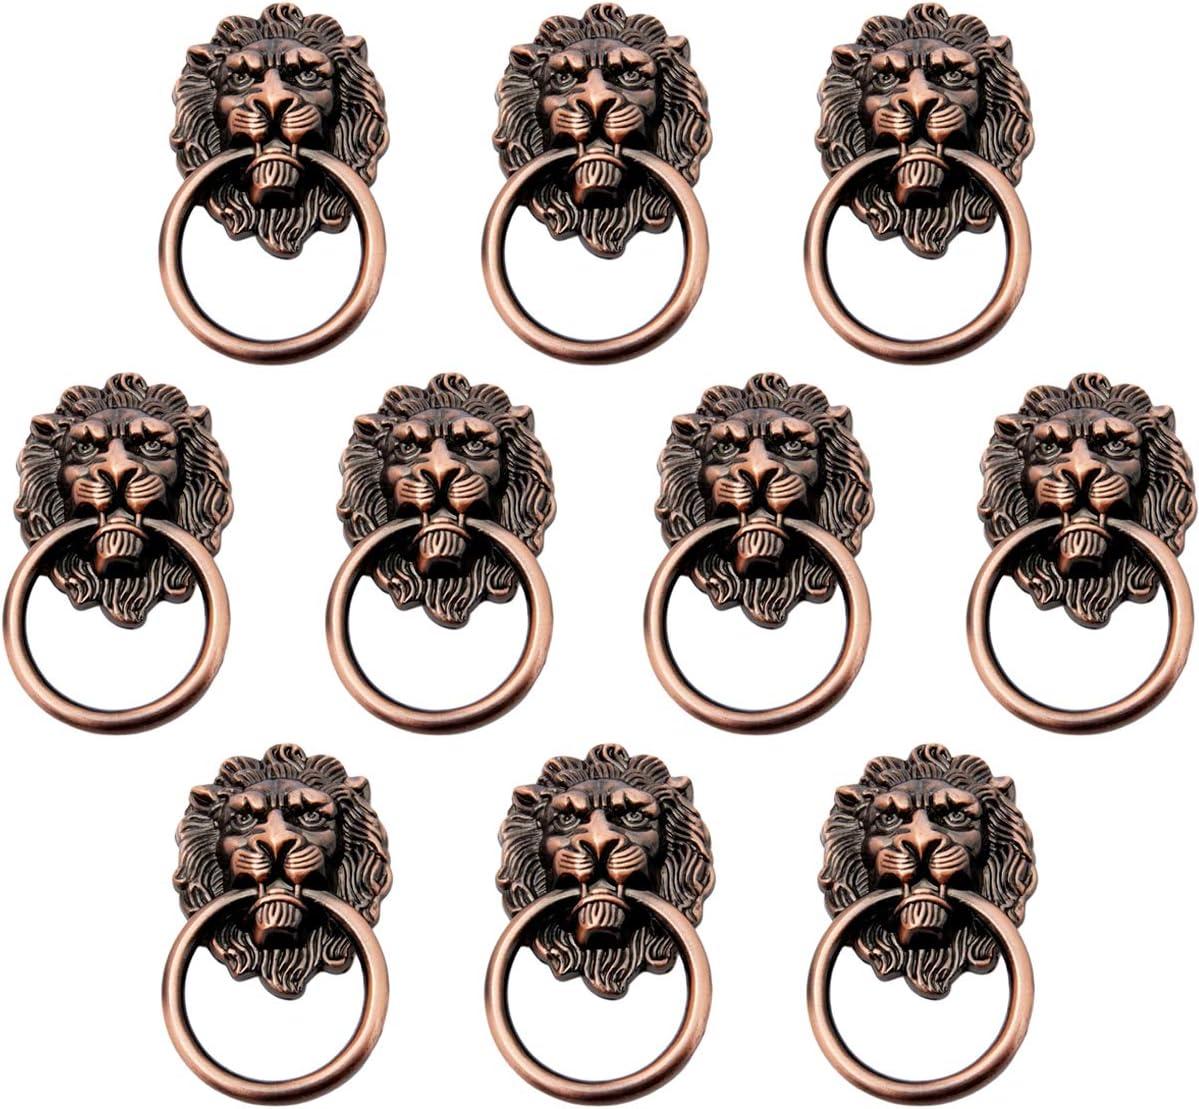 10pcs Creatwls Metall L/öwe Kopf Design M/öbelgriff Schrankgriff M/öbelknopf Zink-Legierung Schrankgriff Kabinett Griff Kleiderschrank Knopf M/öbelzubeh/ör